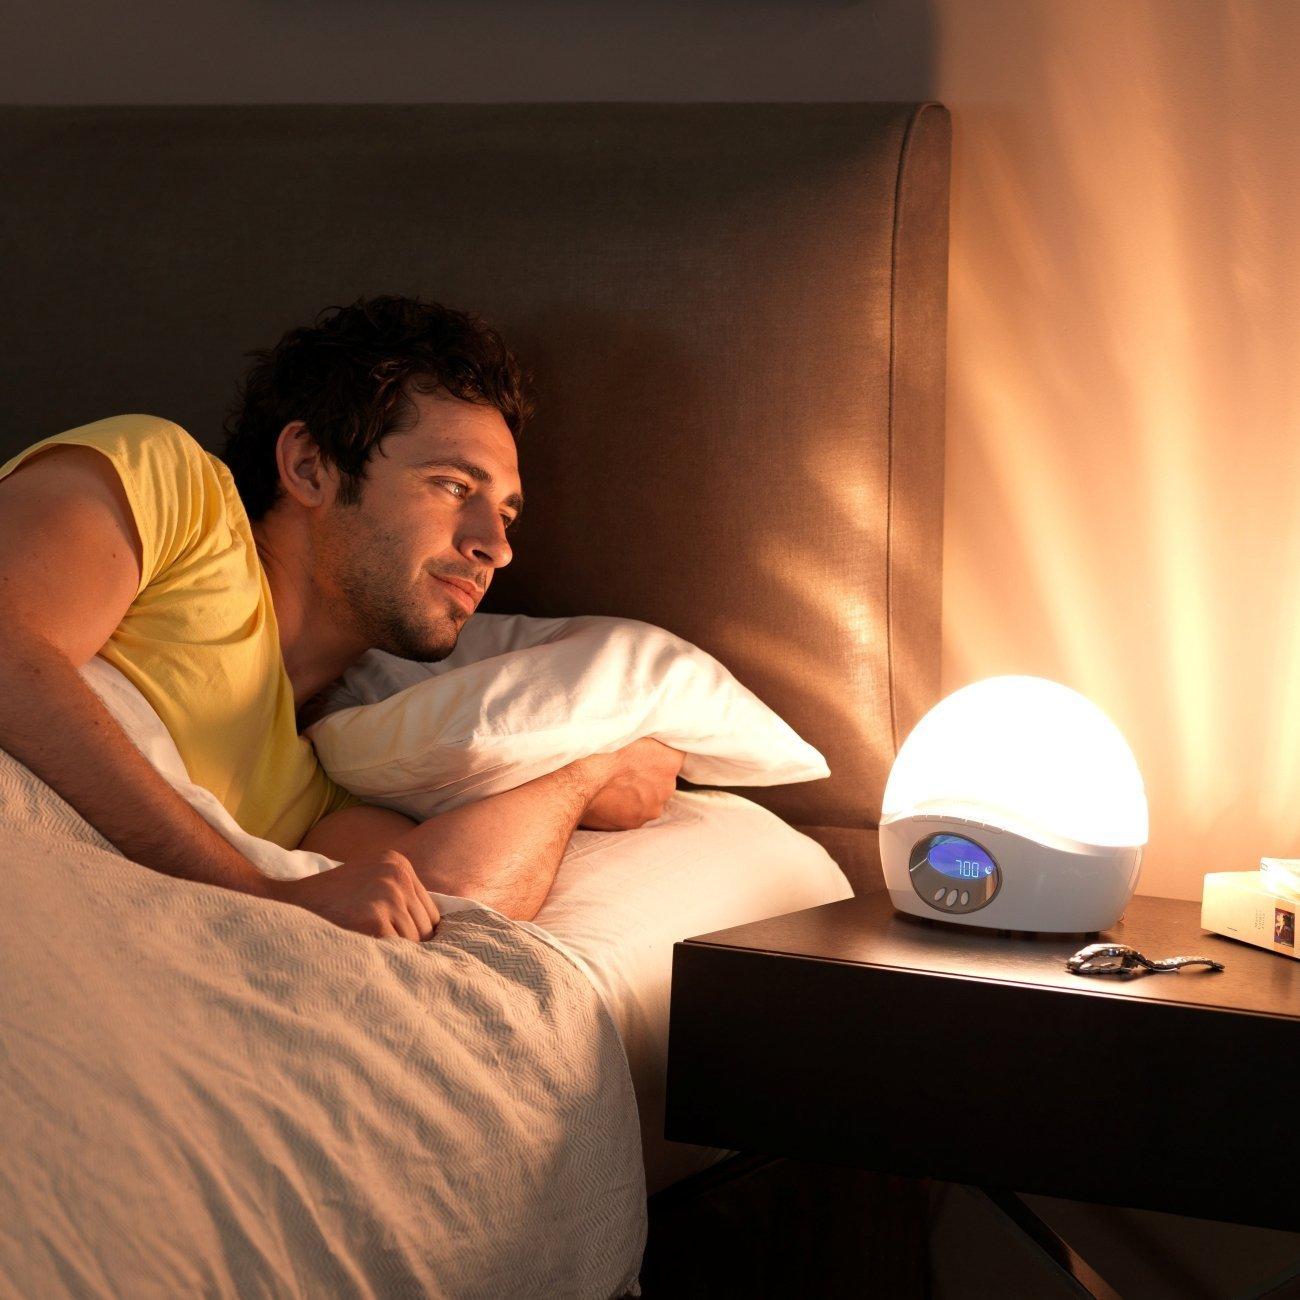 Amazon.com Lumie Bodyclock Active 250 Wake-Up Light Alarm Clock with FM Radio and Extra Audio Options Health u0026 Personal Care  sc 1 st  Amazon.com & Amazon.com: Lumie Bodyclock Active 250 Wake-Up Light Alarm Clock ... azcodes.com